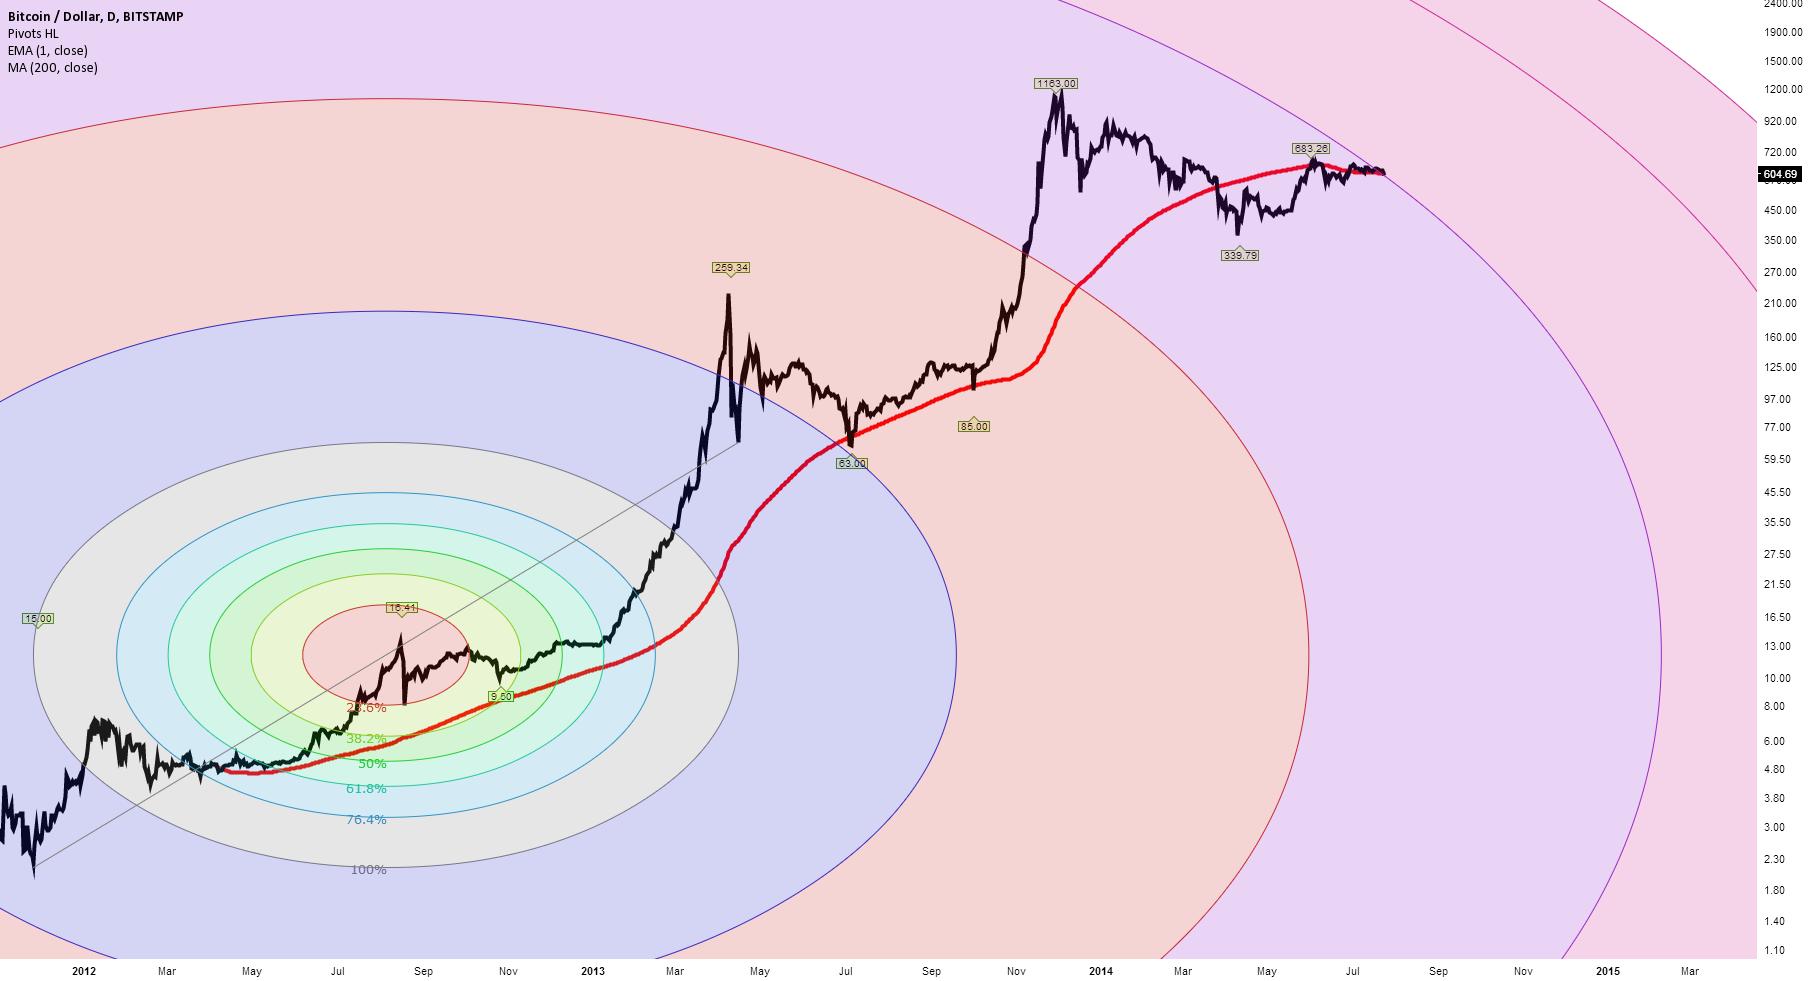 Best Bitcoin Price Chart - 2012 to 2014